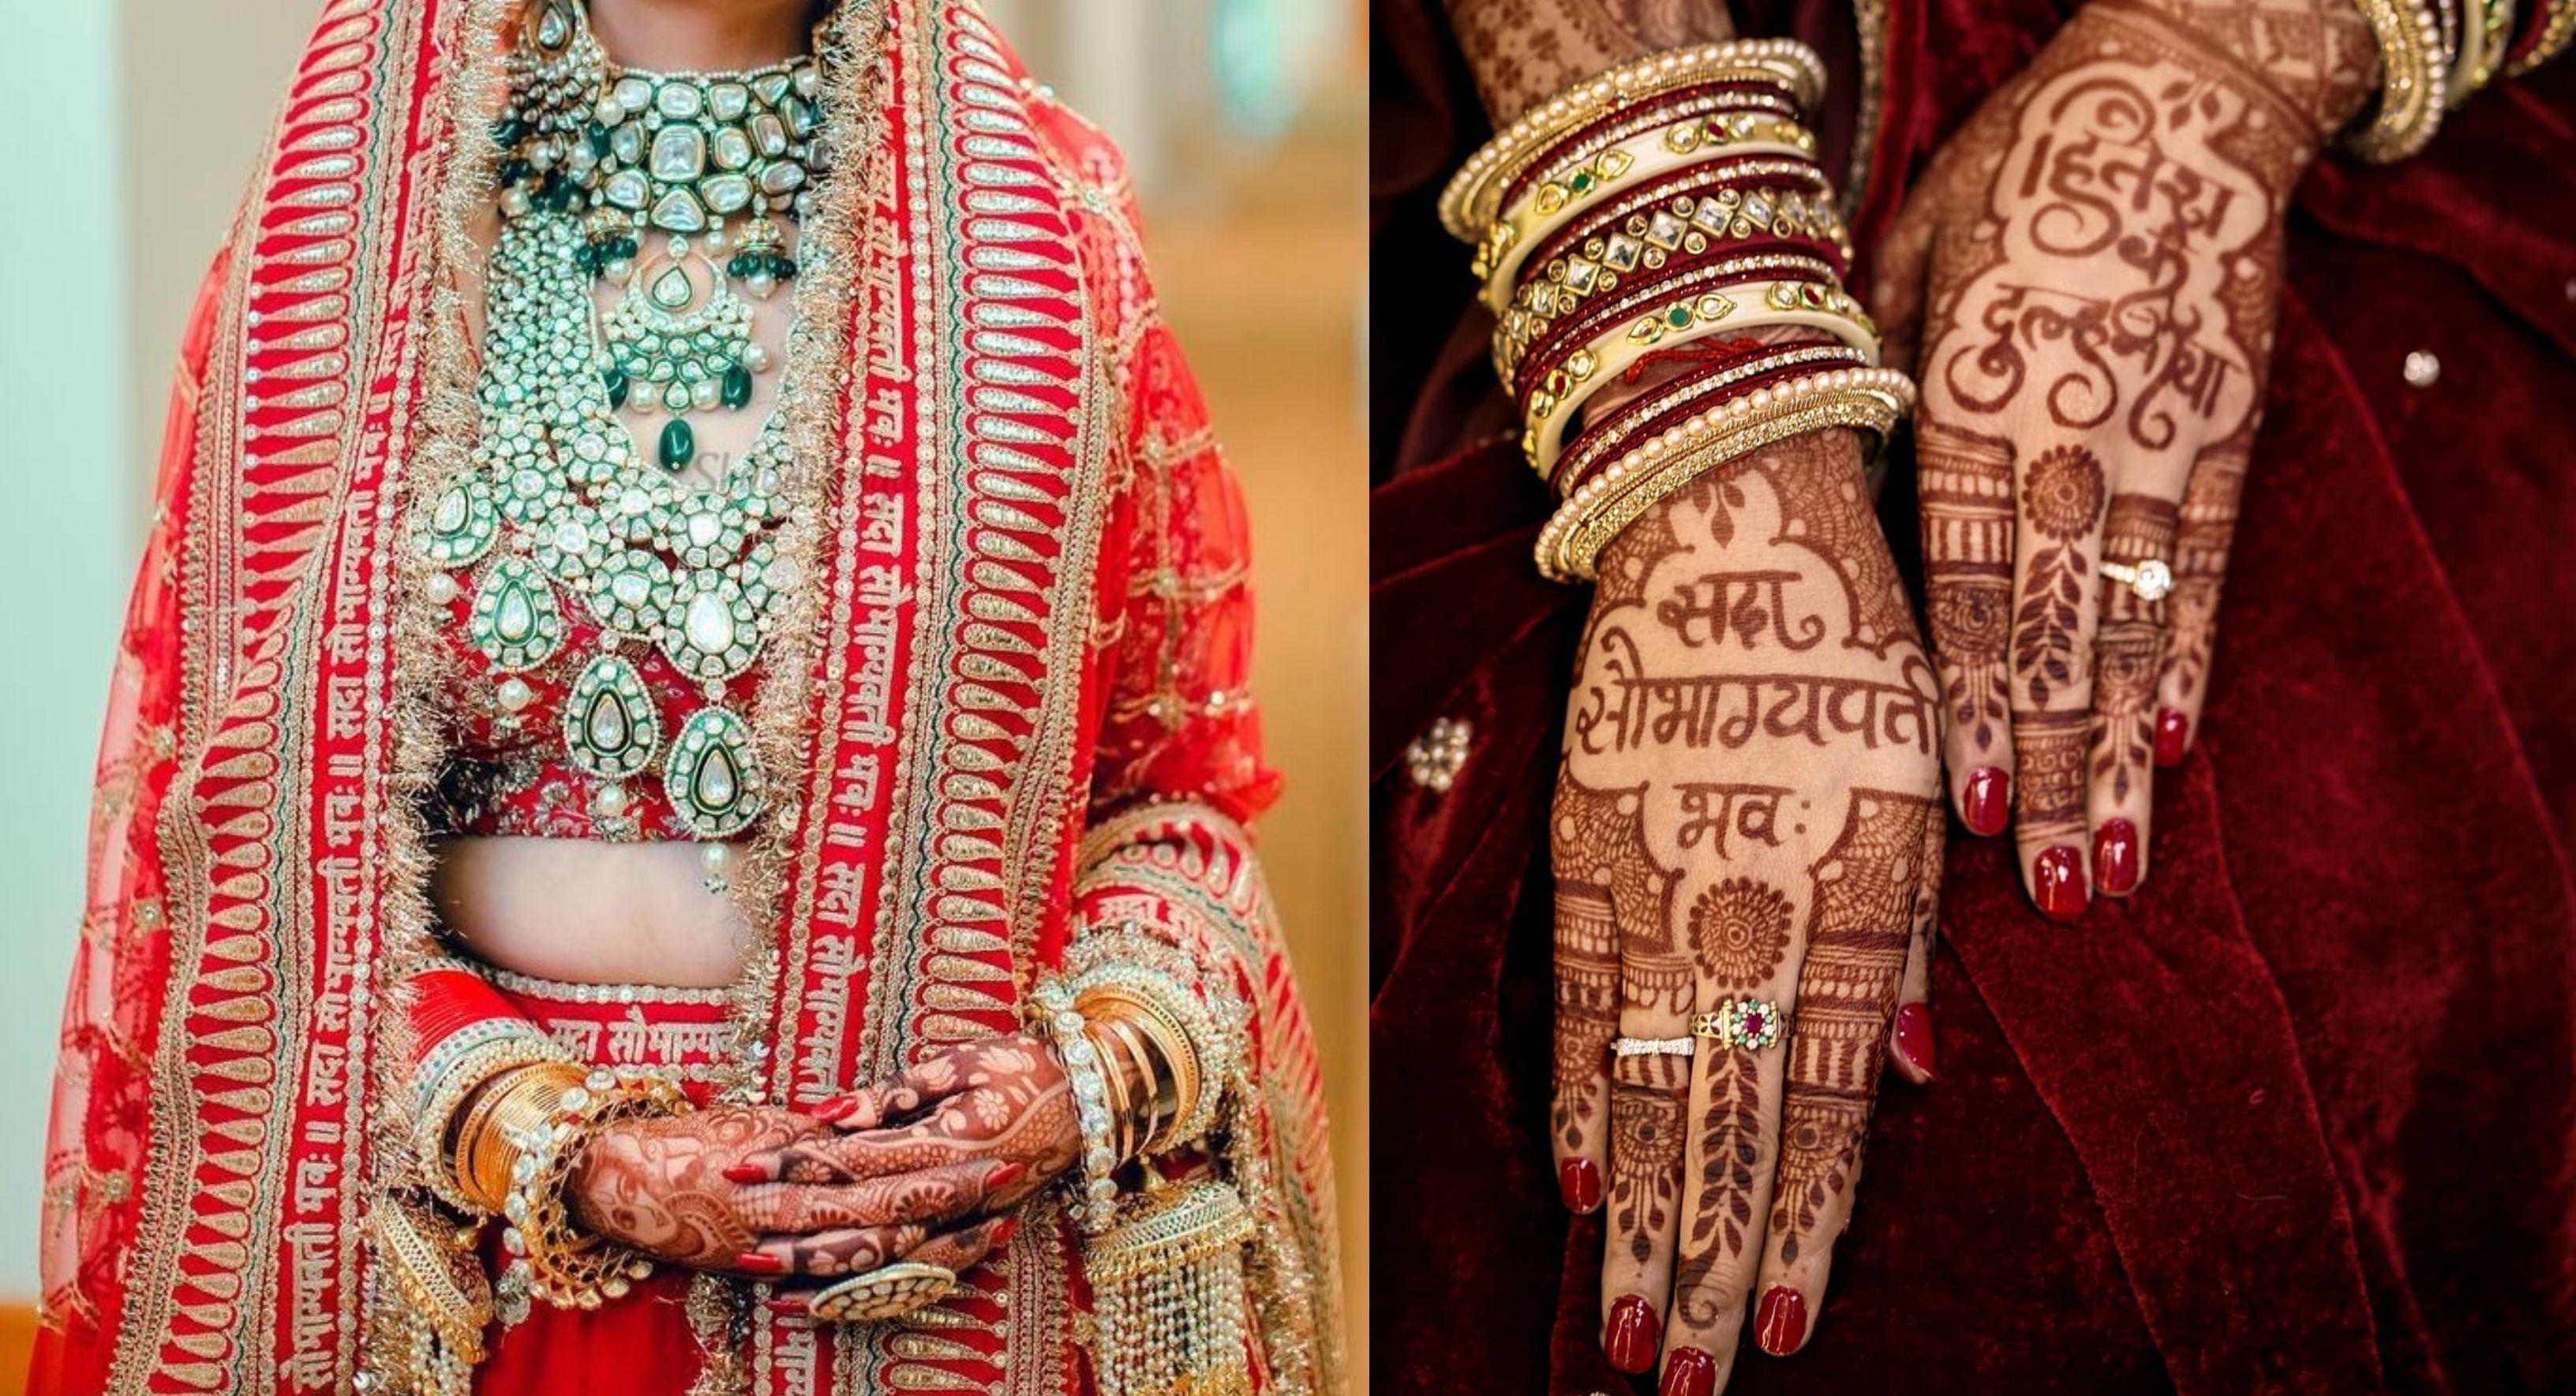 Trendiest Ways To Include Sada Saubhagyavati Bhava In Your Bridal Look Bridal Looks Couple Wedding Dress Bridal Blouse Designs